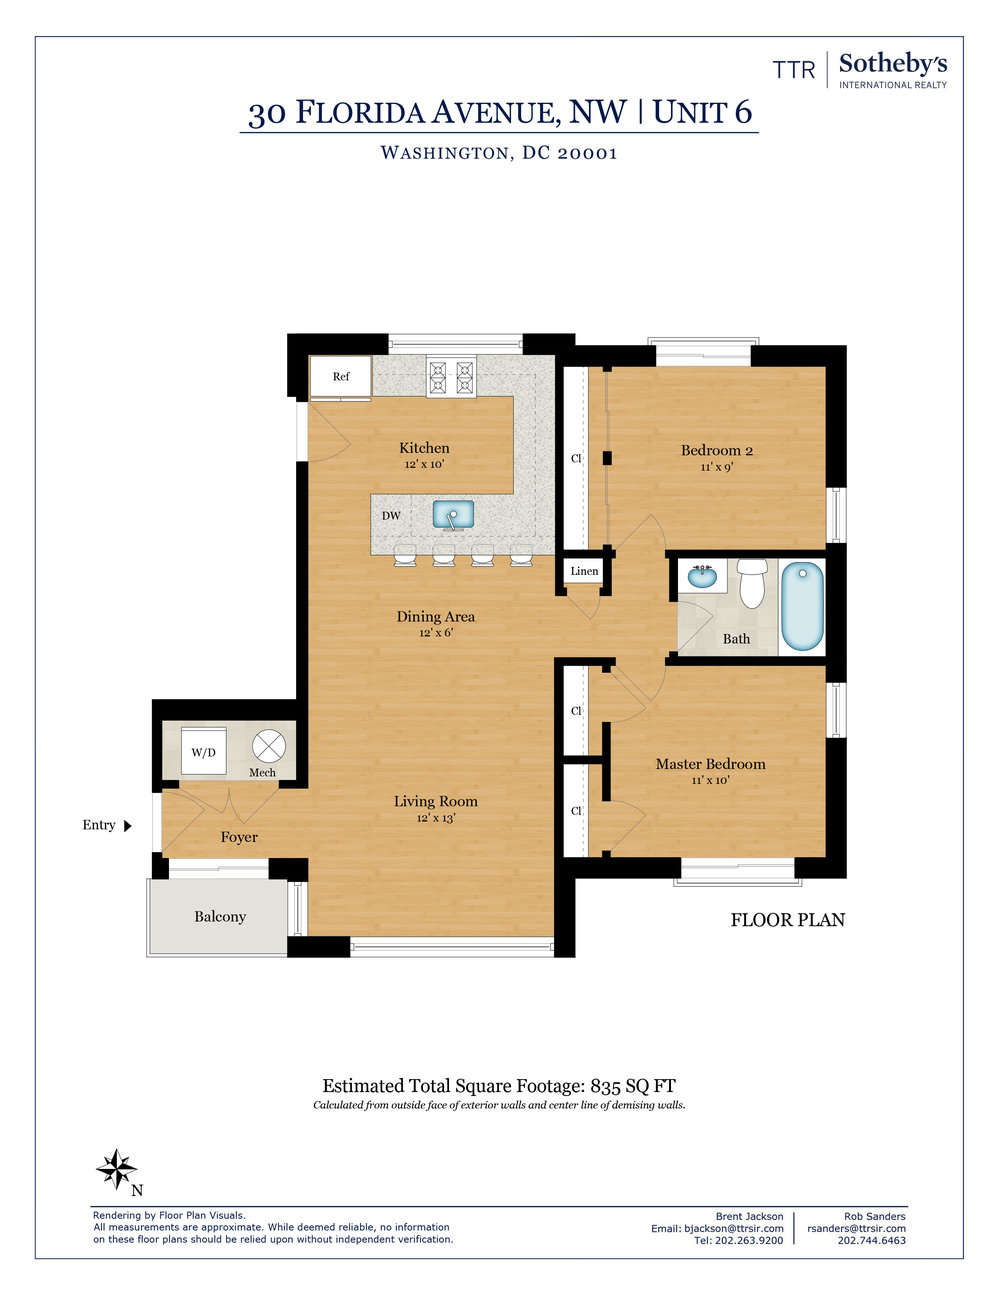 BJ-30FloridaAveNW#6-FloorPlan-Print-R1.jpg